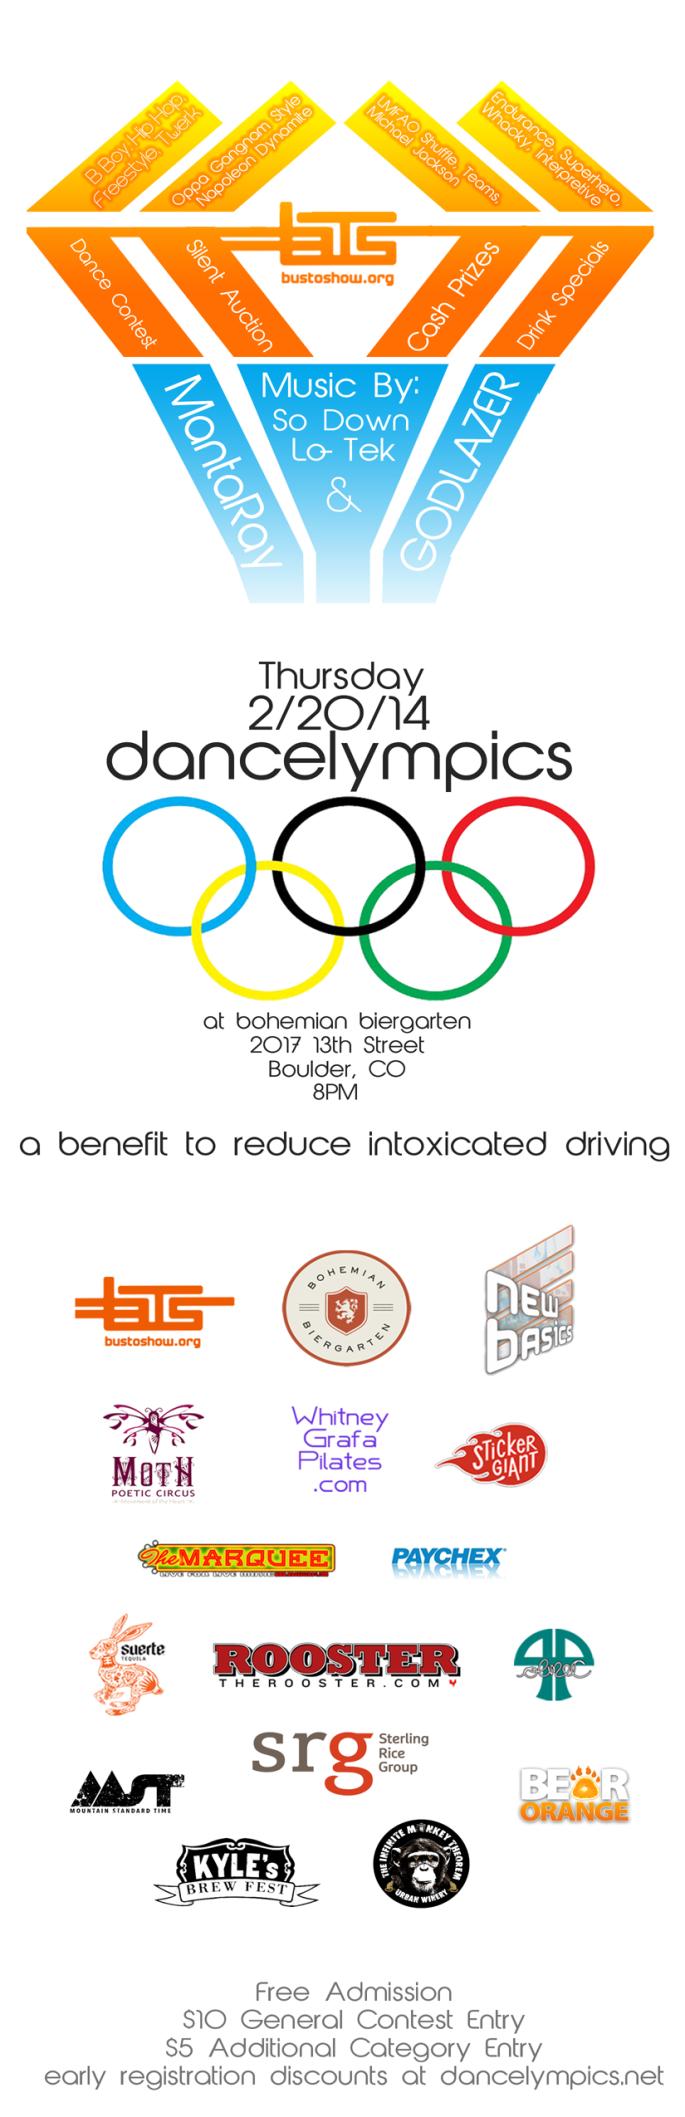 dancelympics-poster-5_5x17-flat